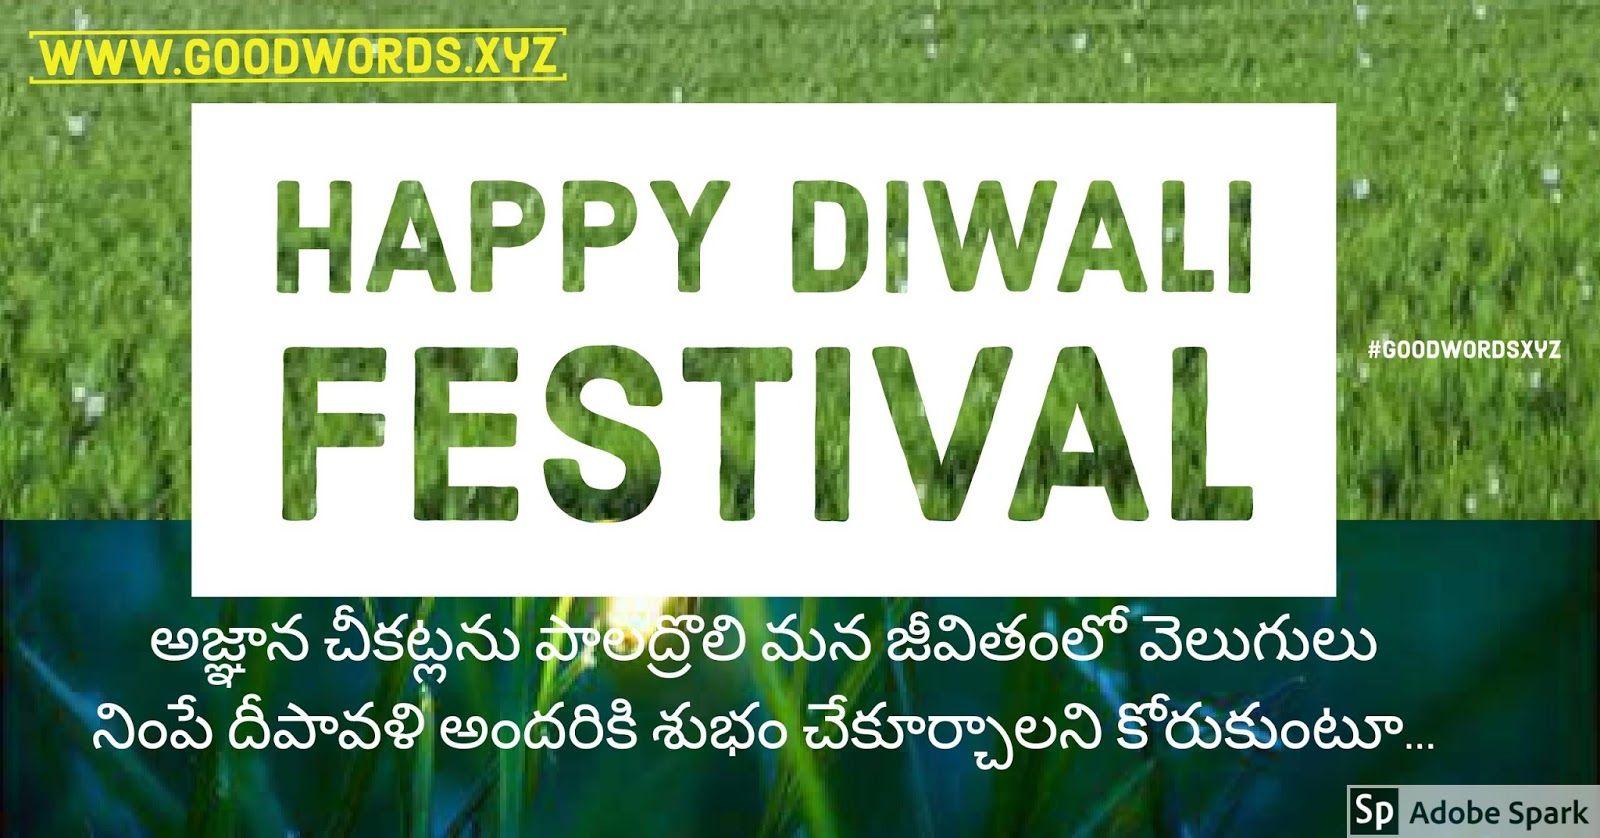 Telugu deepavali greetings picture messages good words xyz telugu deepavali greetings picture messages m4hsunfo